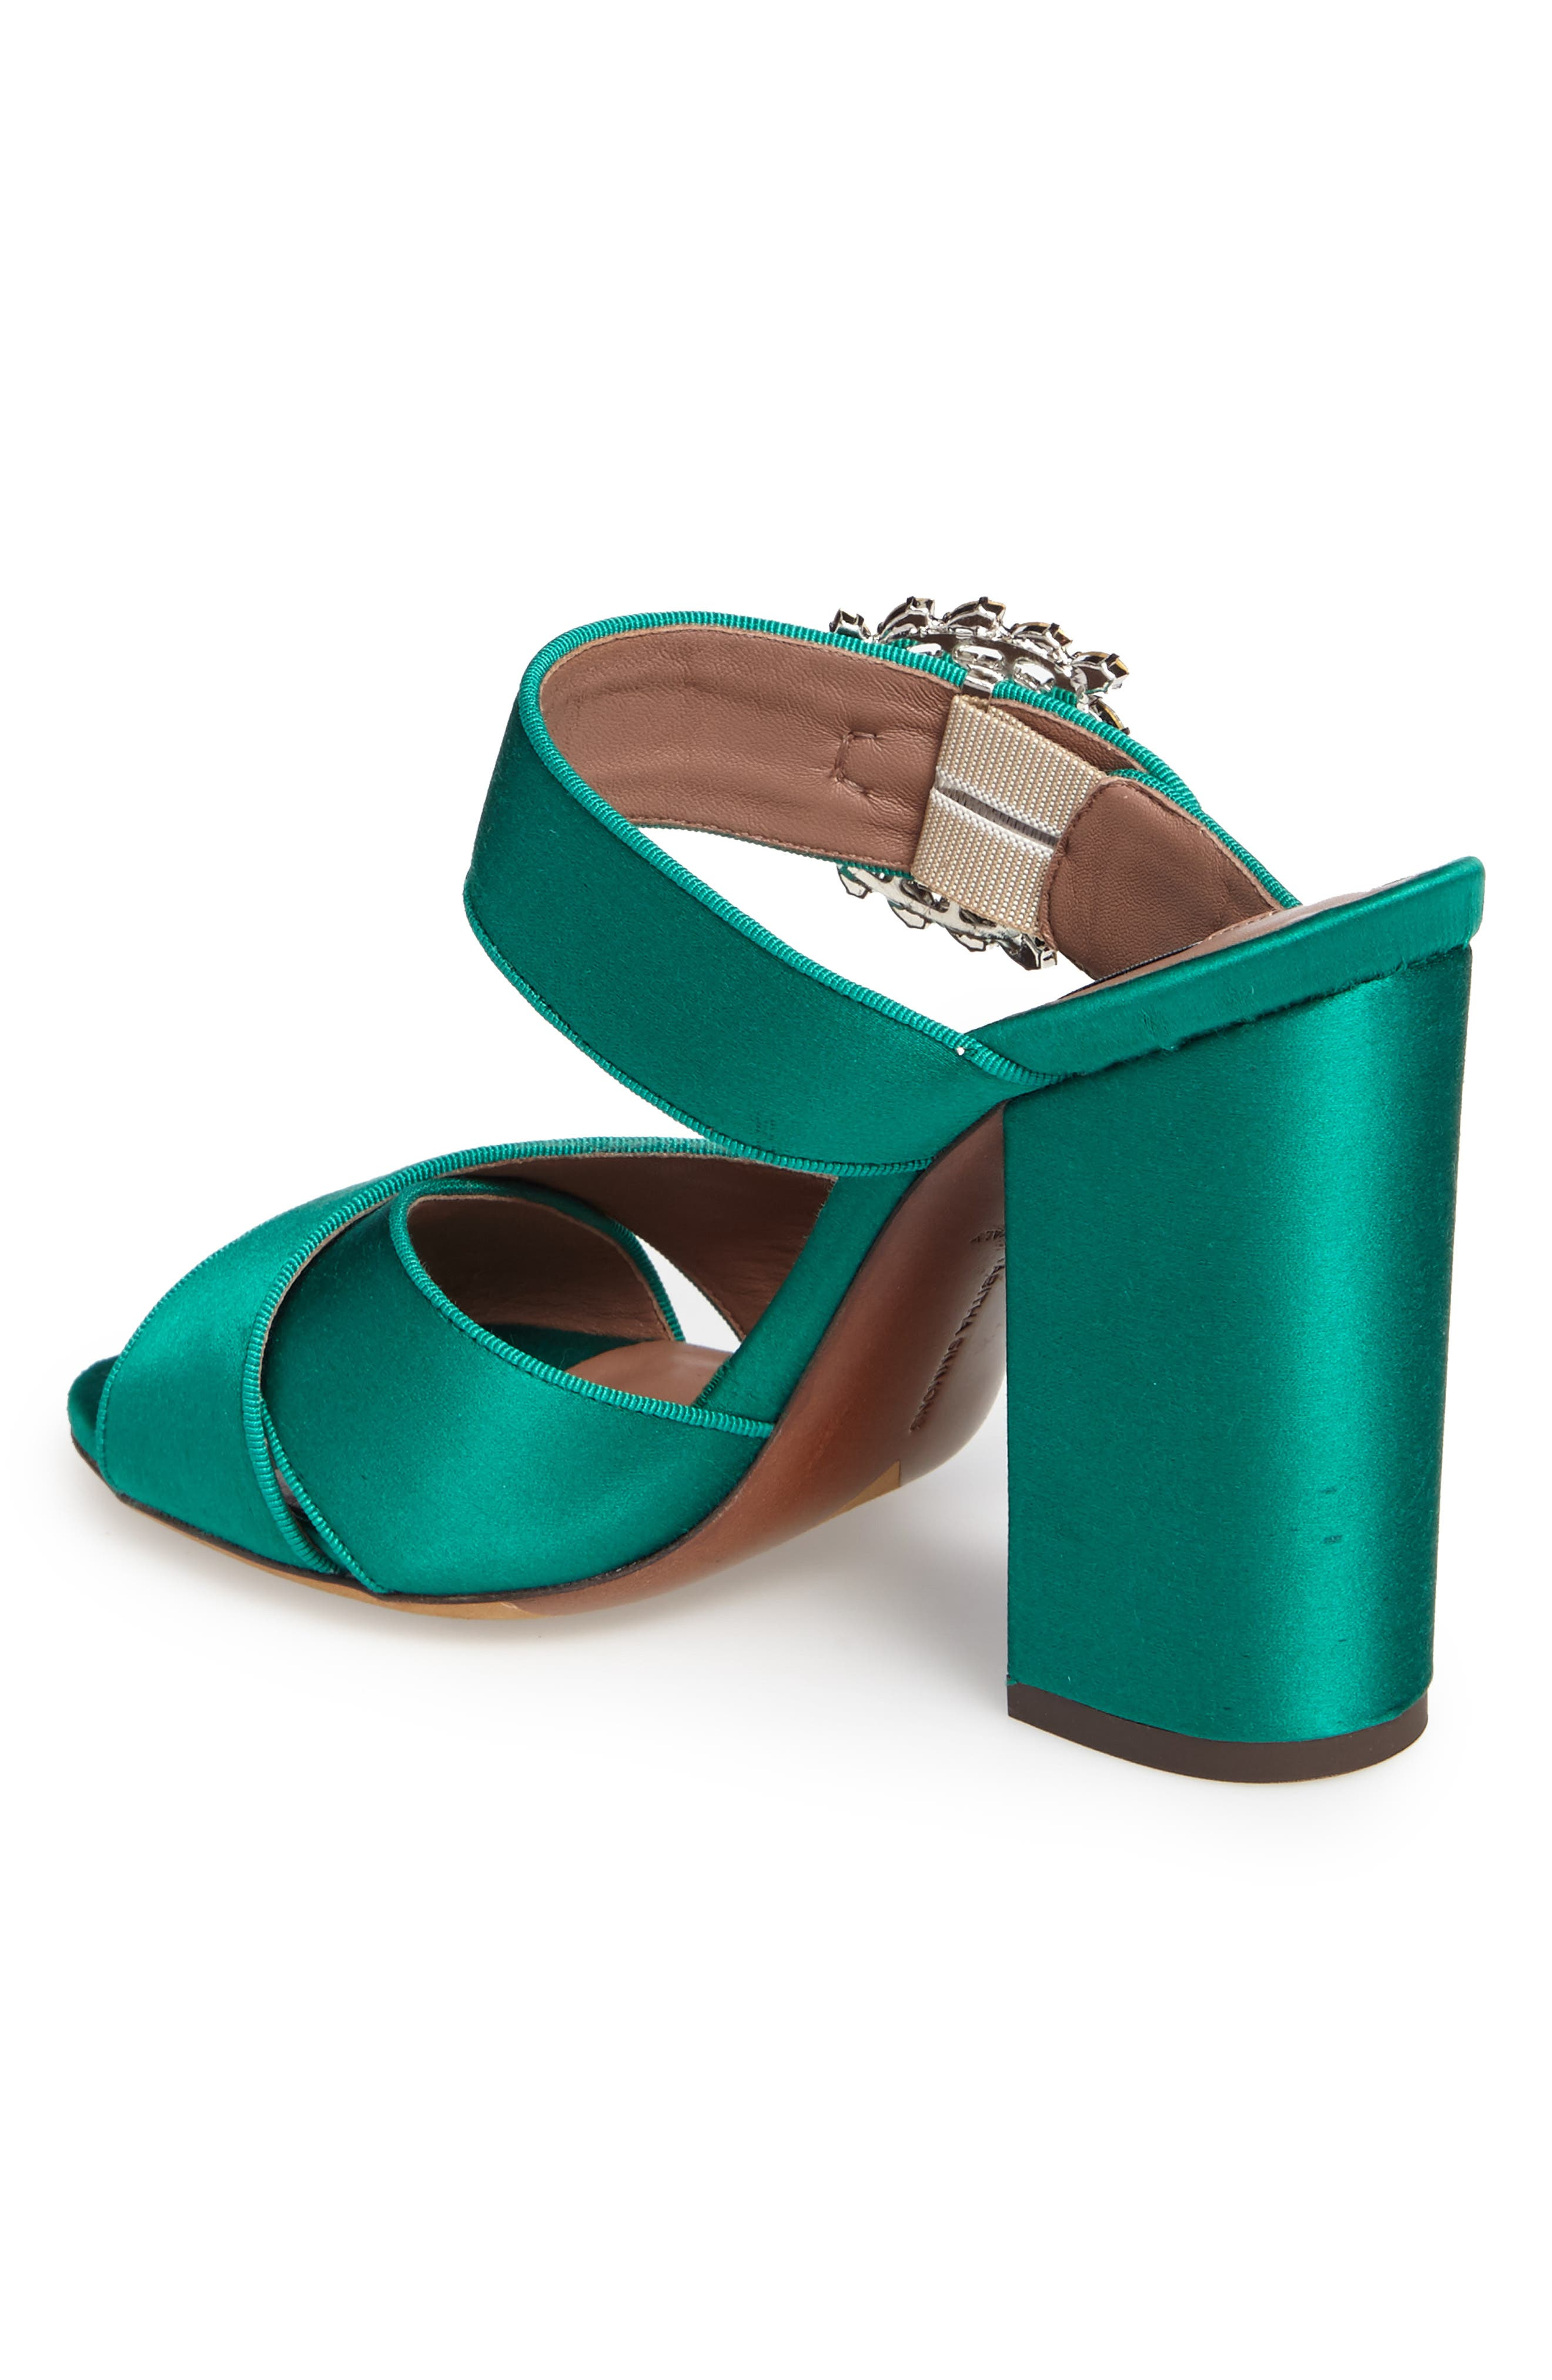 Reyner Crystal Buckle Sandal,                             Alternate thumbnail 2, color,                             Emerald Green